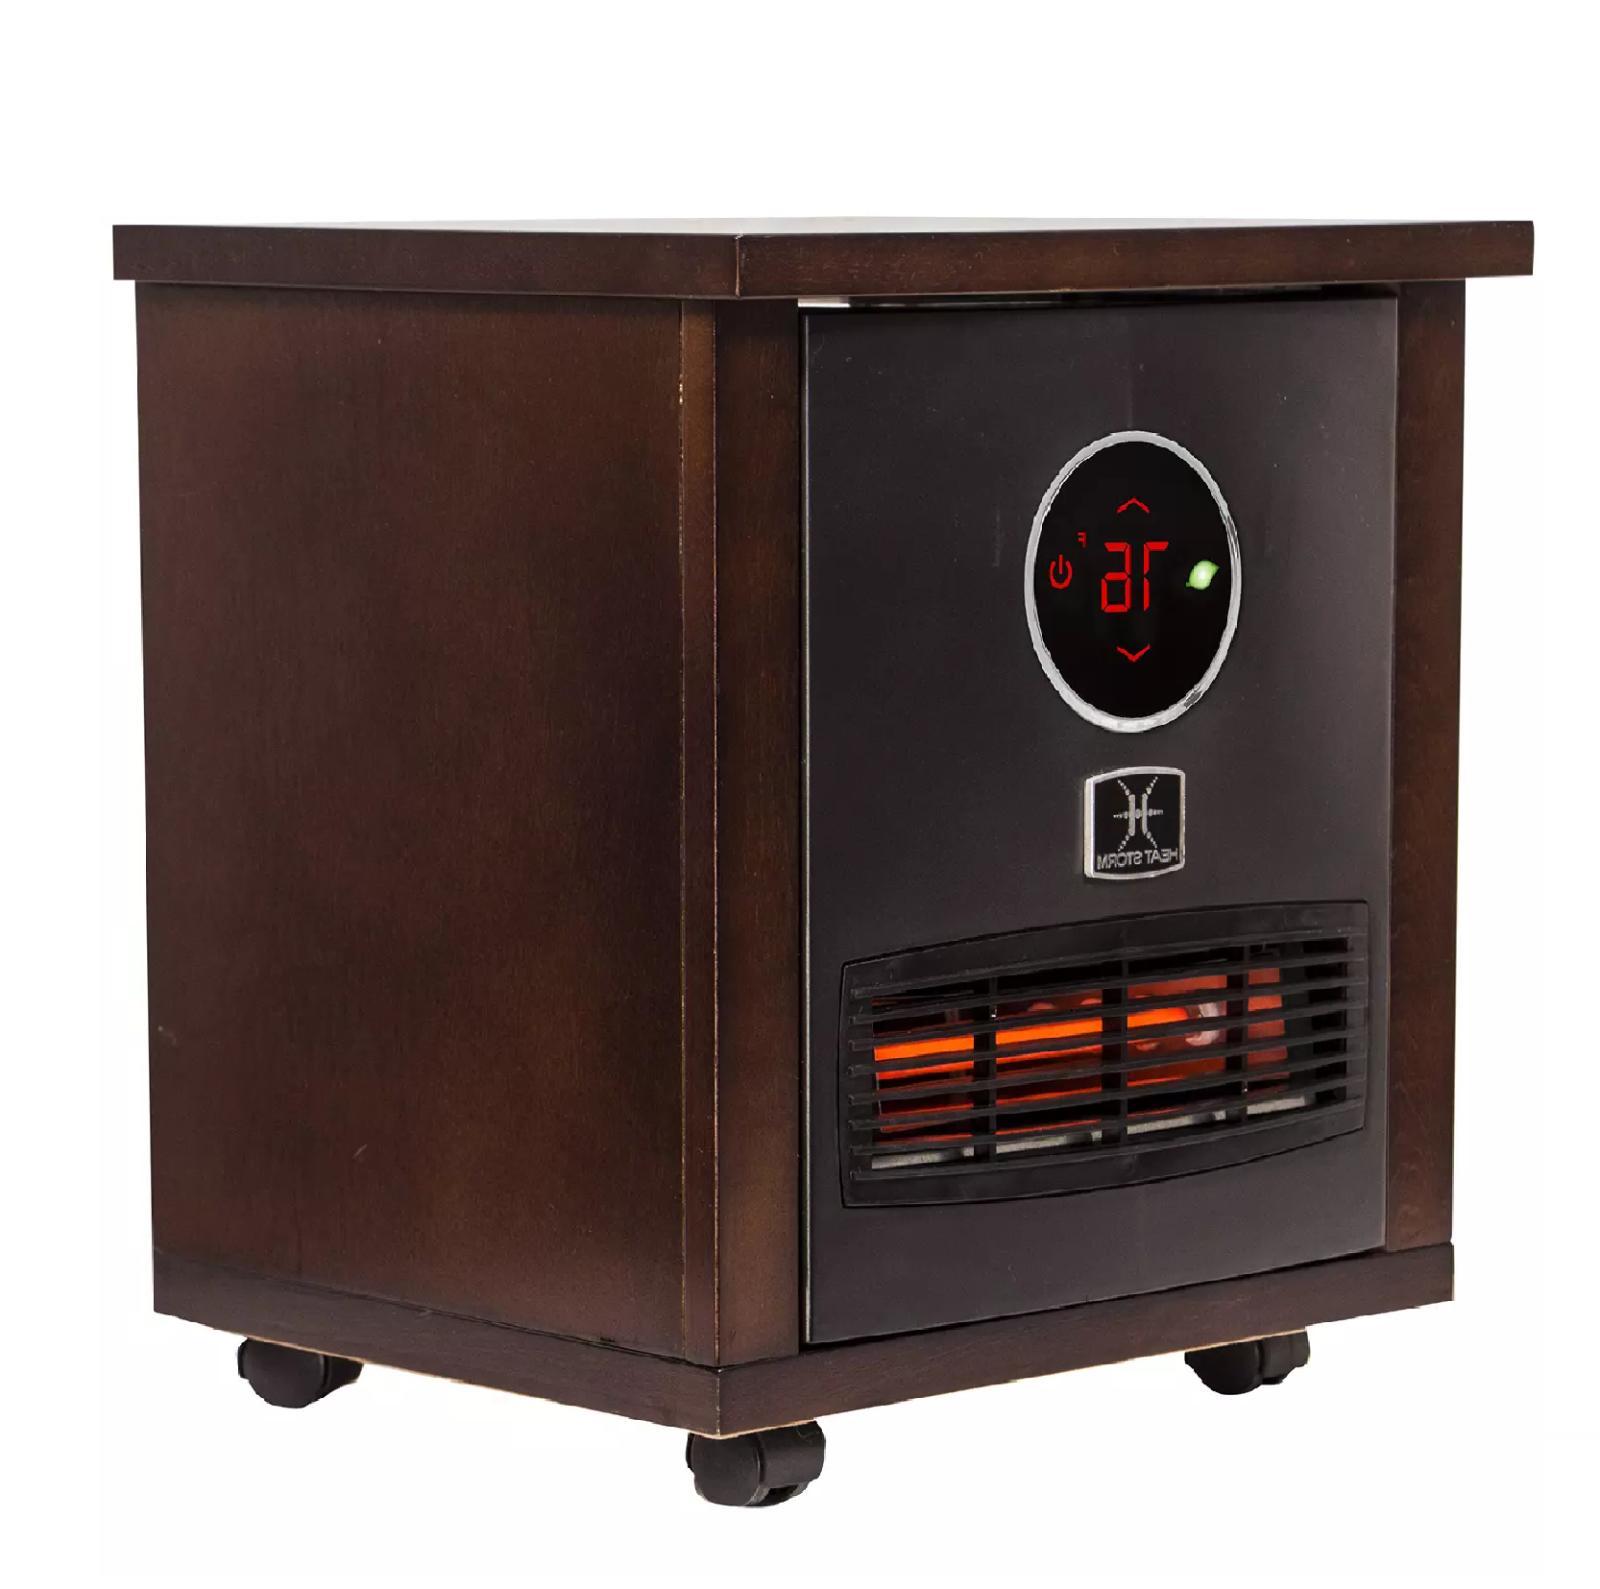 Heat Logan Classic Infrared Wood Heater wall